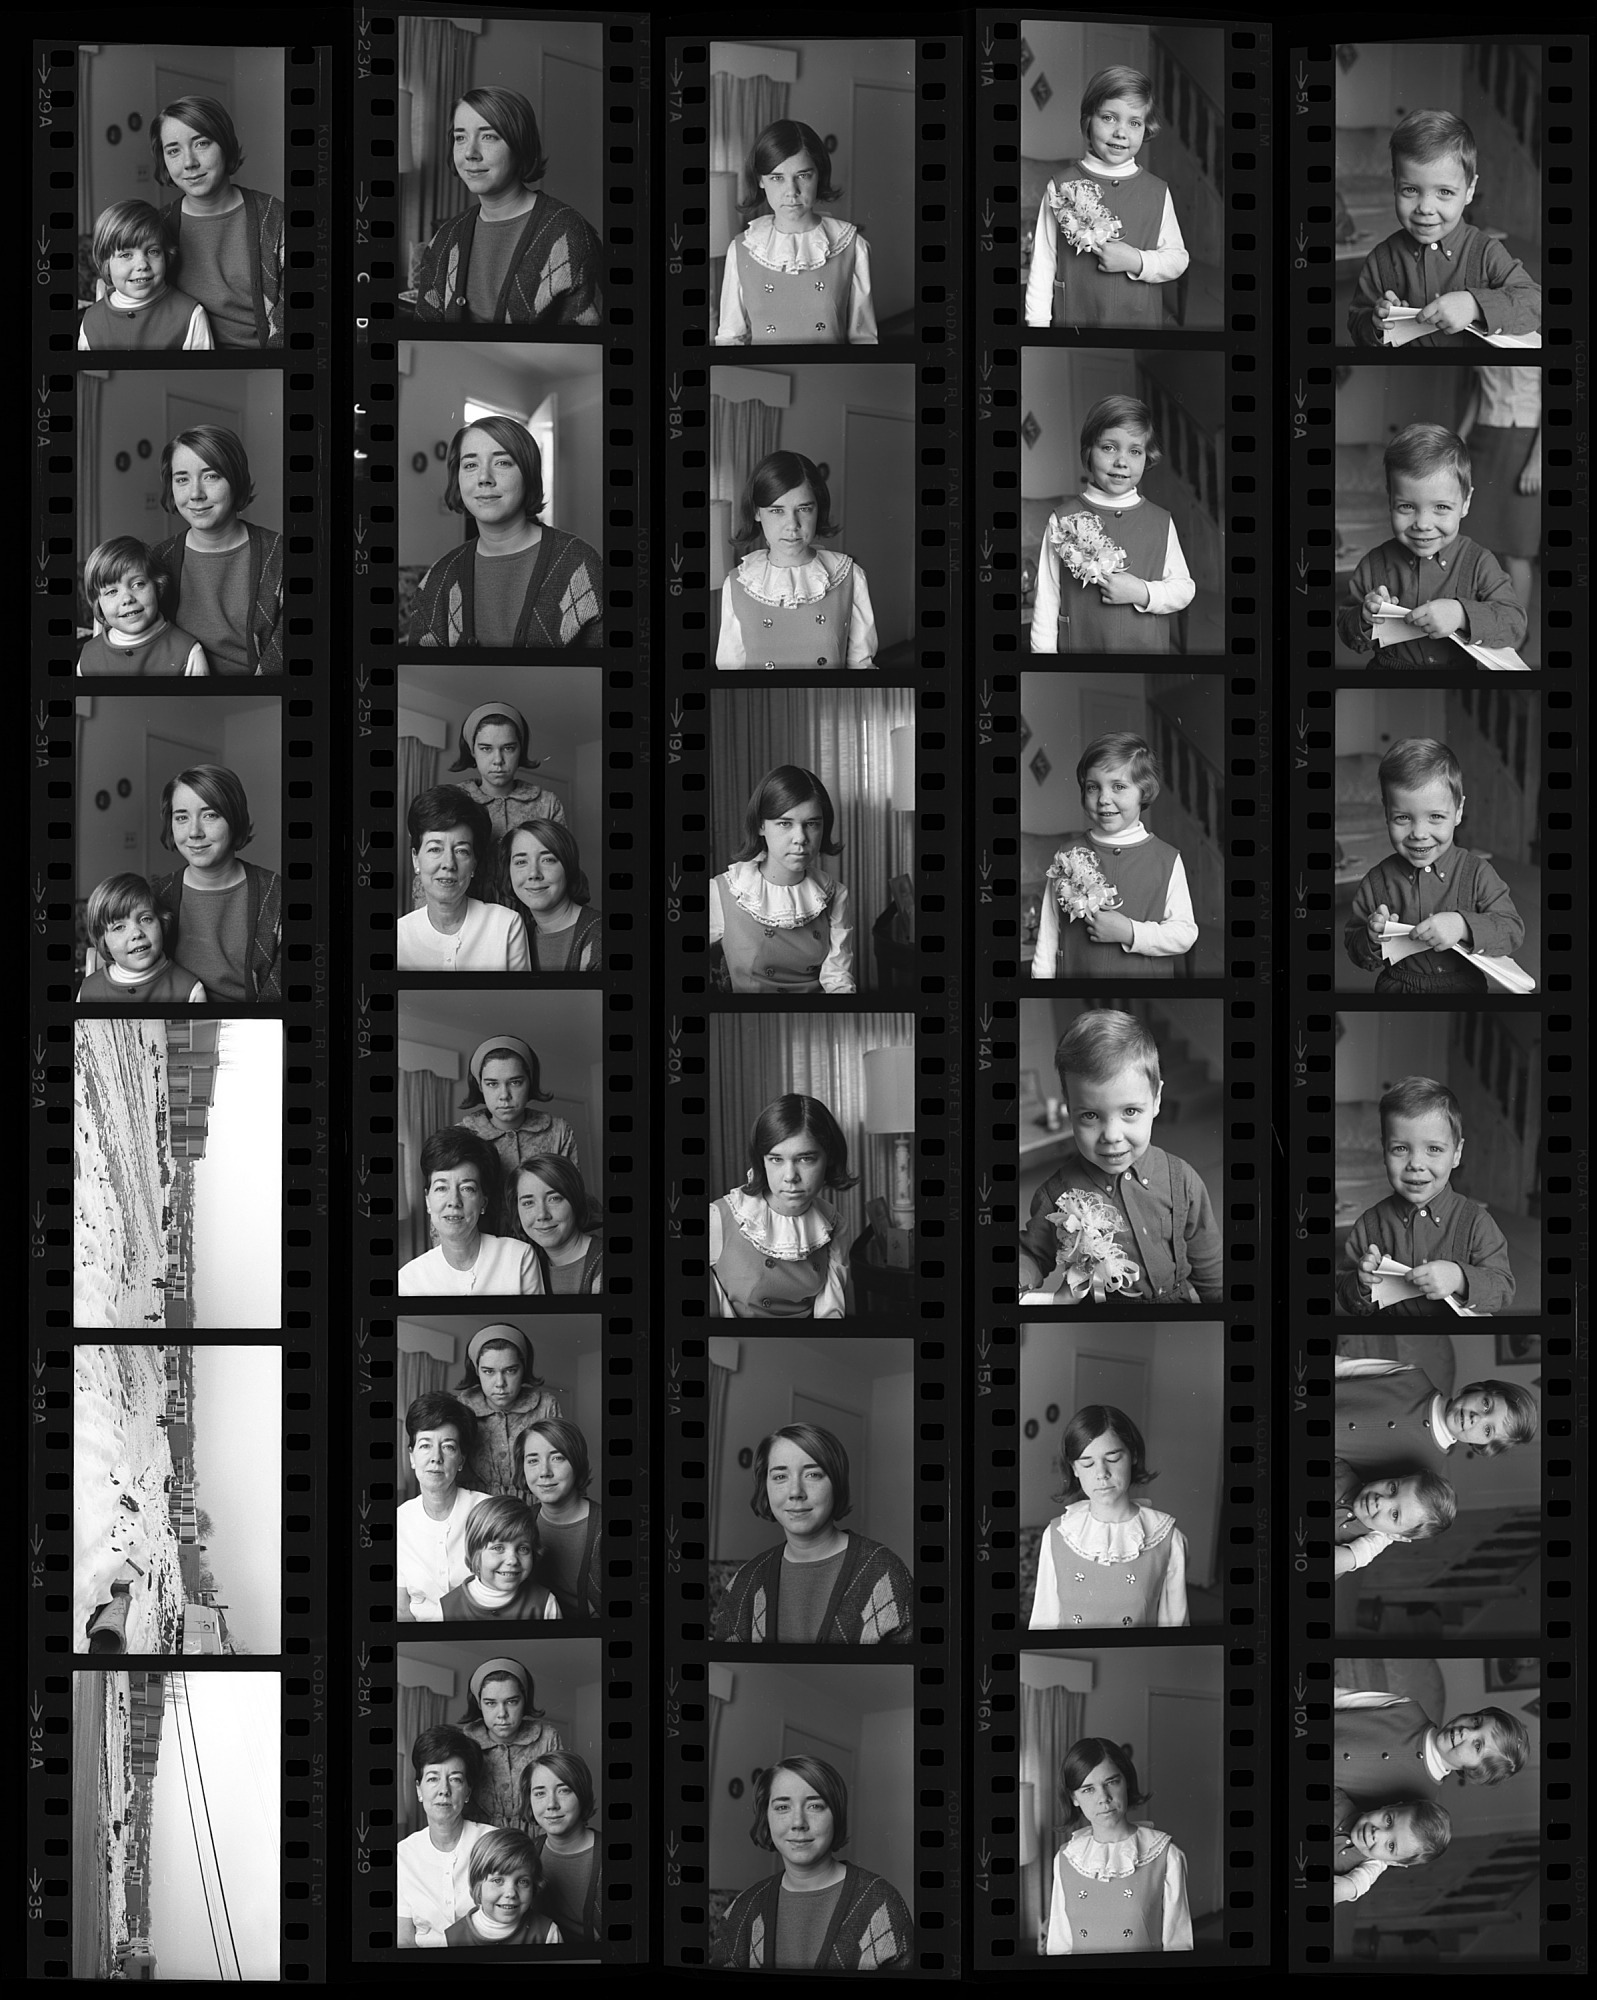 Unidentified Portraits; Unidentified Construction